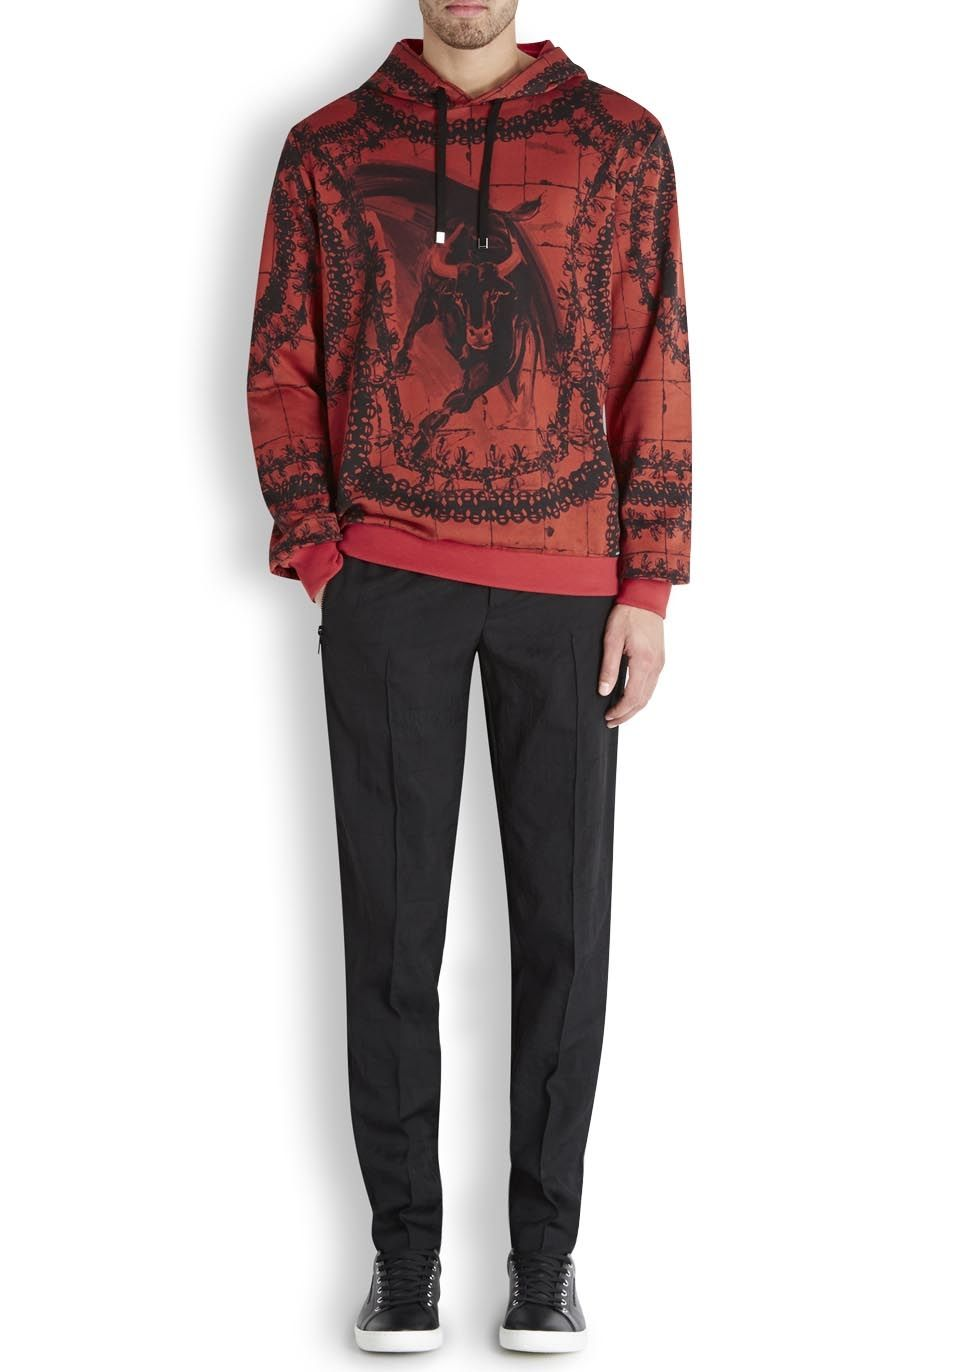 DOLCE & GABBANA Red bull print cotton sweatshirt (SC116113) £385.00